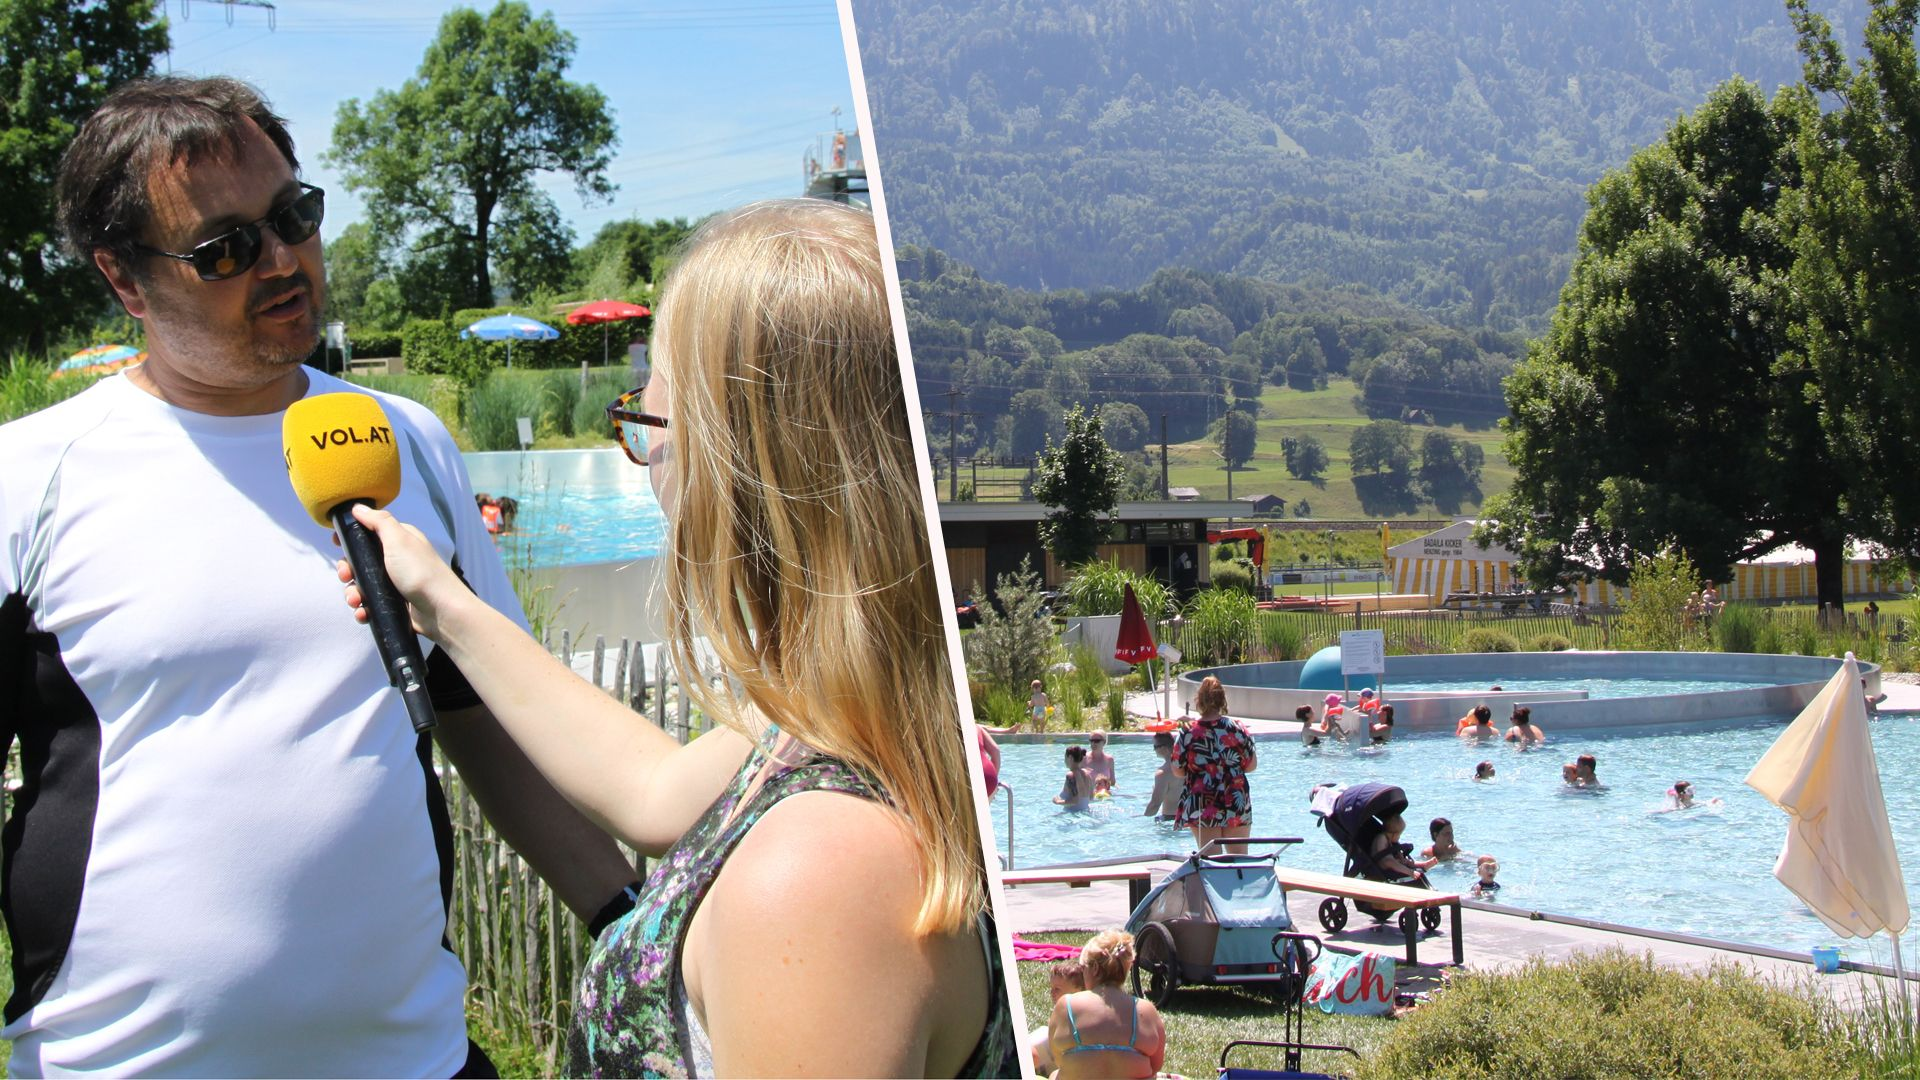 Lebensretter nach Nenzinger Badeunfall: Badegäste sollen aufeinander Acht geben